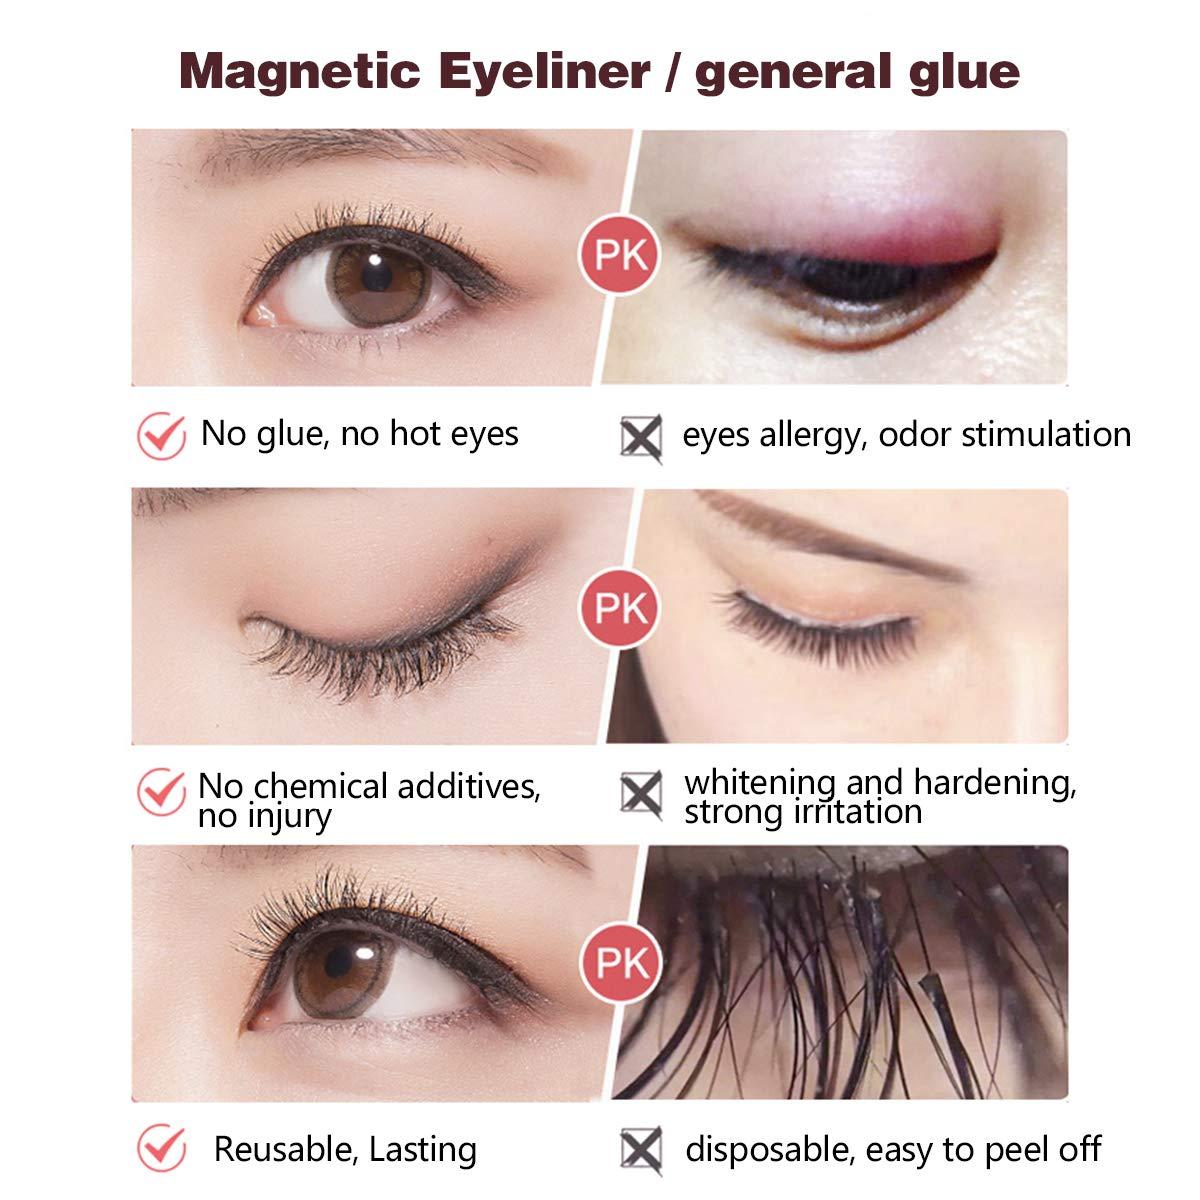 Magnetic Eyelashes Eyeliner Set, Waterproof Long Lasting Magnetic Eyeliner and Lashes Eyelashes Kit, Magnet 3D Eyelashes & 2 PCS Liquid Eyeliner with Eyelash Tweezers,Reusable Silk False Lashes set